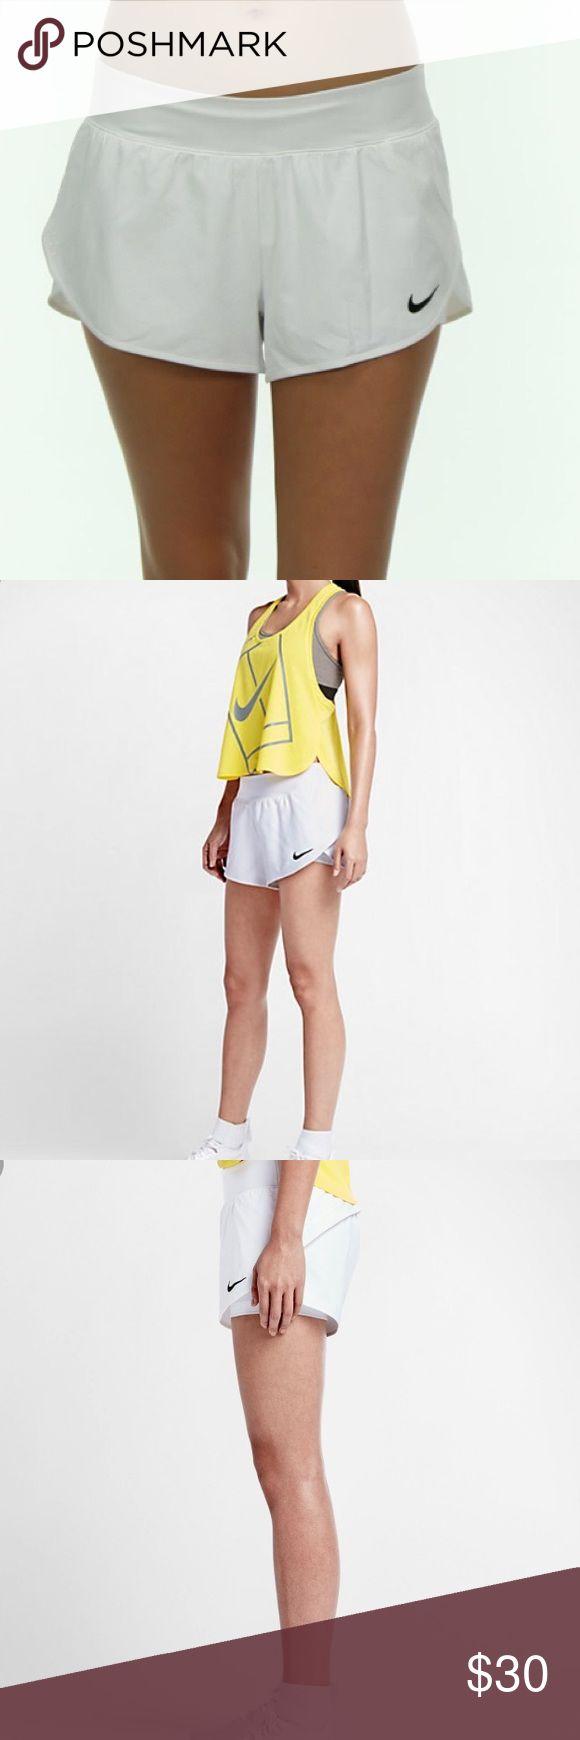 Nike Ace Tennis Shorts Nike court Ace Tennis Shorts in size L.  EUC.  White with black swoosh. Nike Shorts